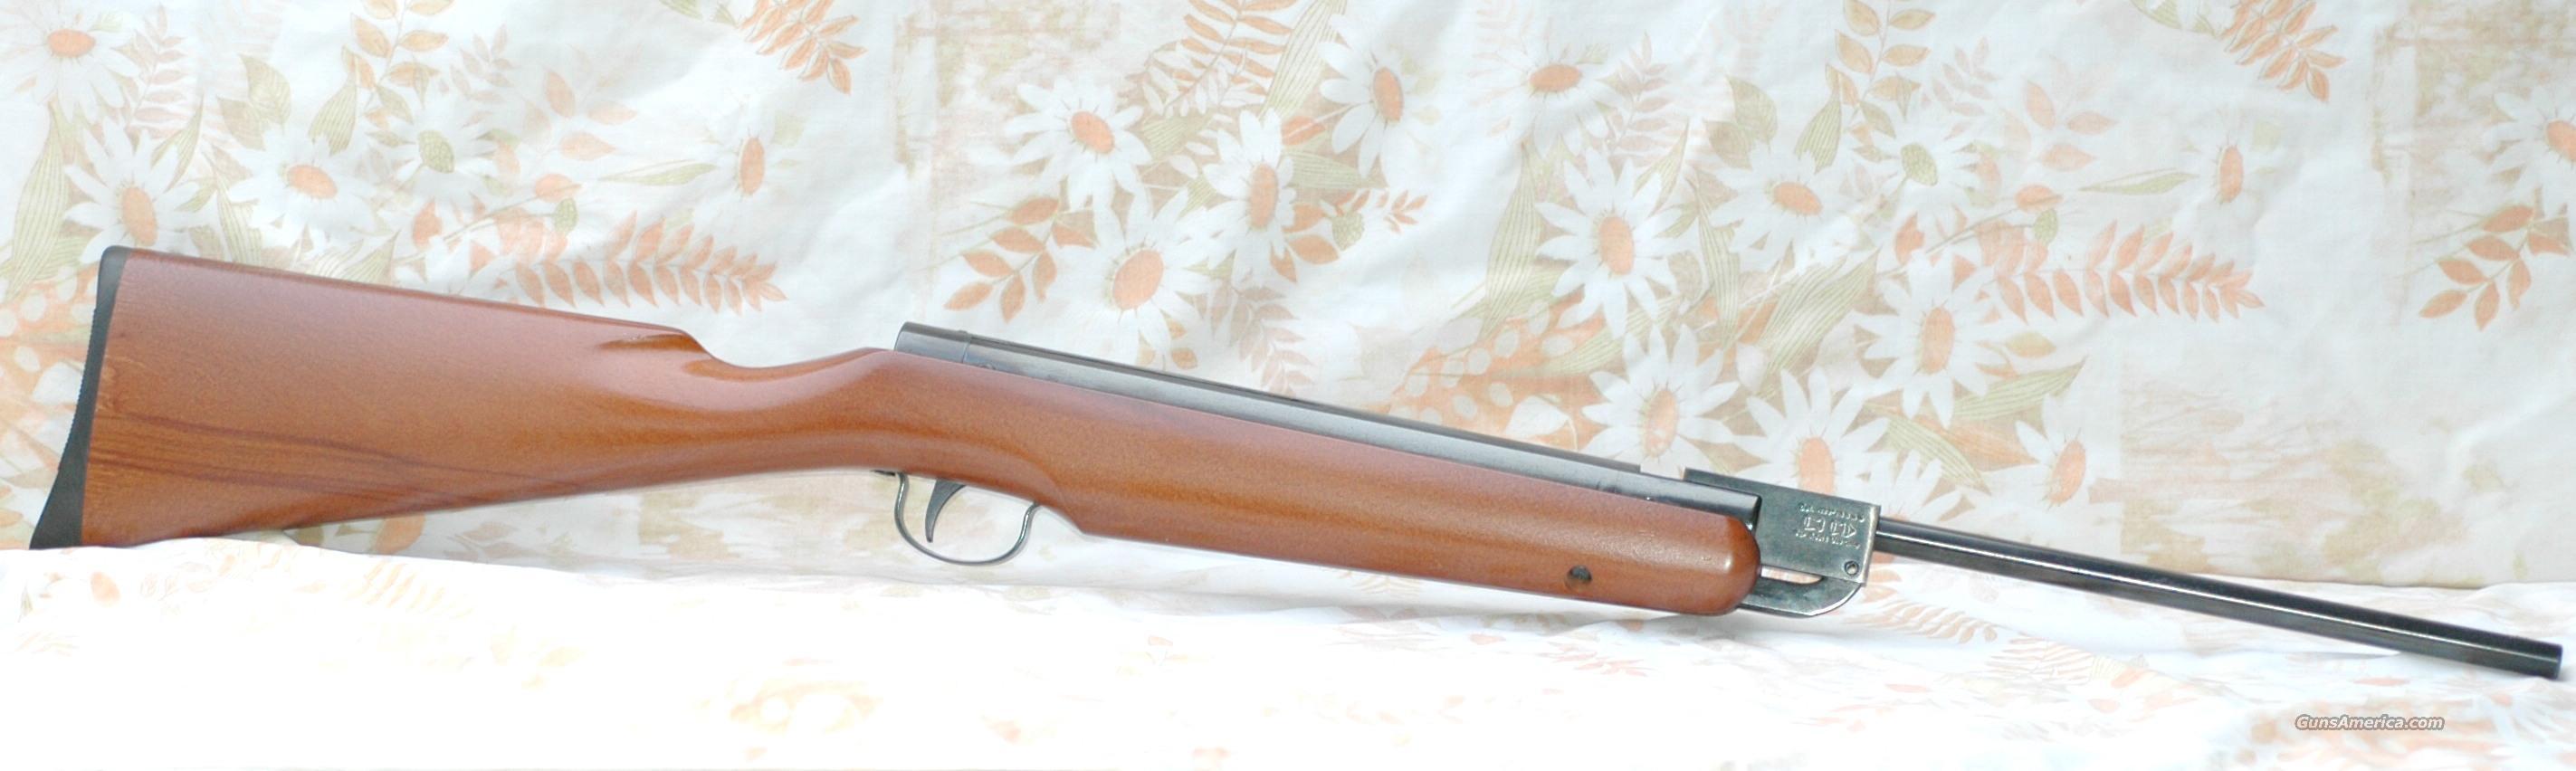 Beeman C1, Beeman C1 Carbine  Non-Guns > Air Rifles - Pistols > Adult High Velocity